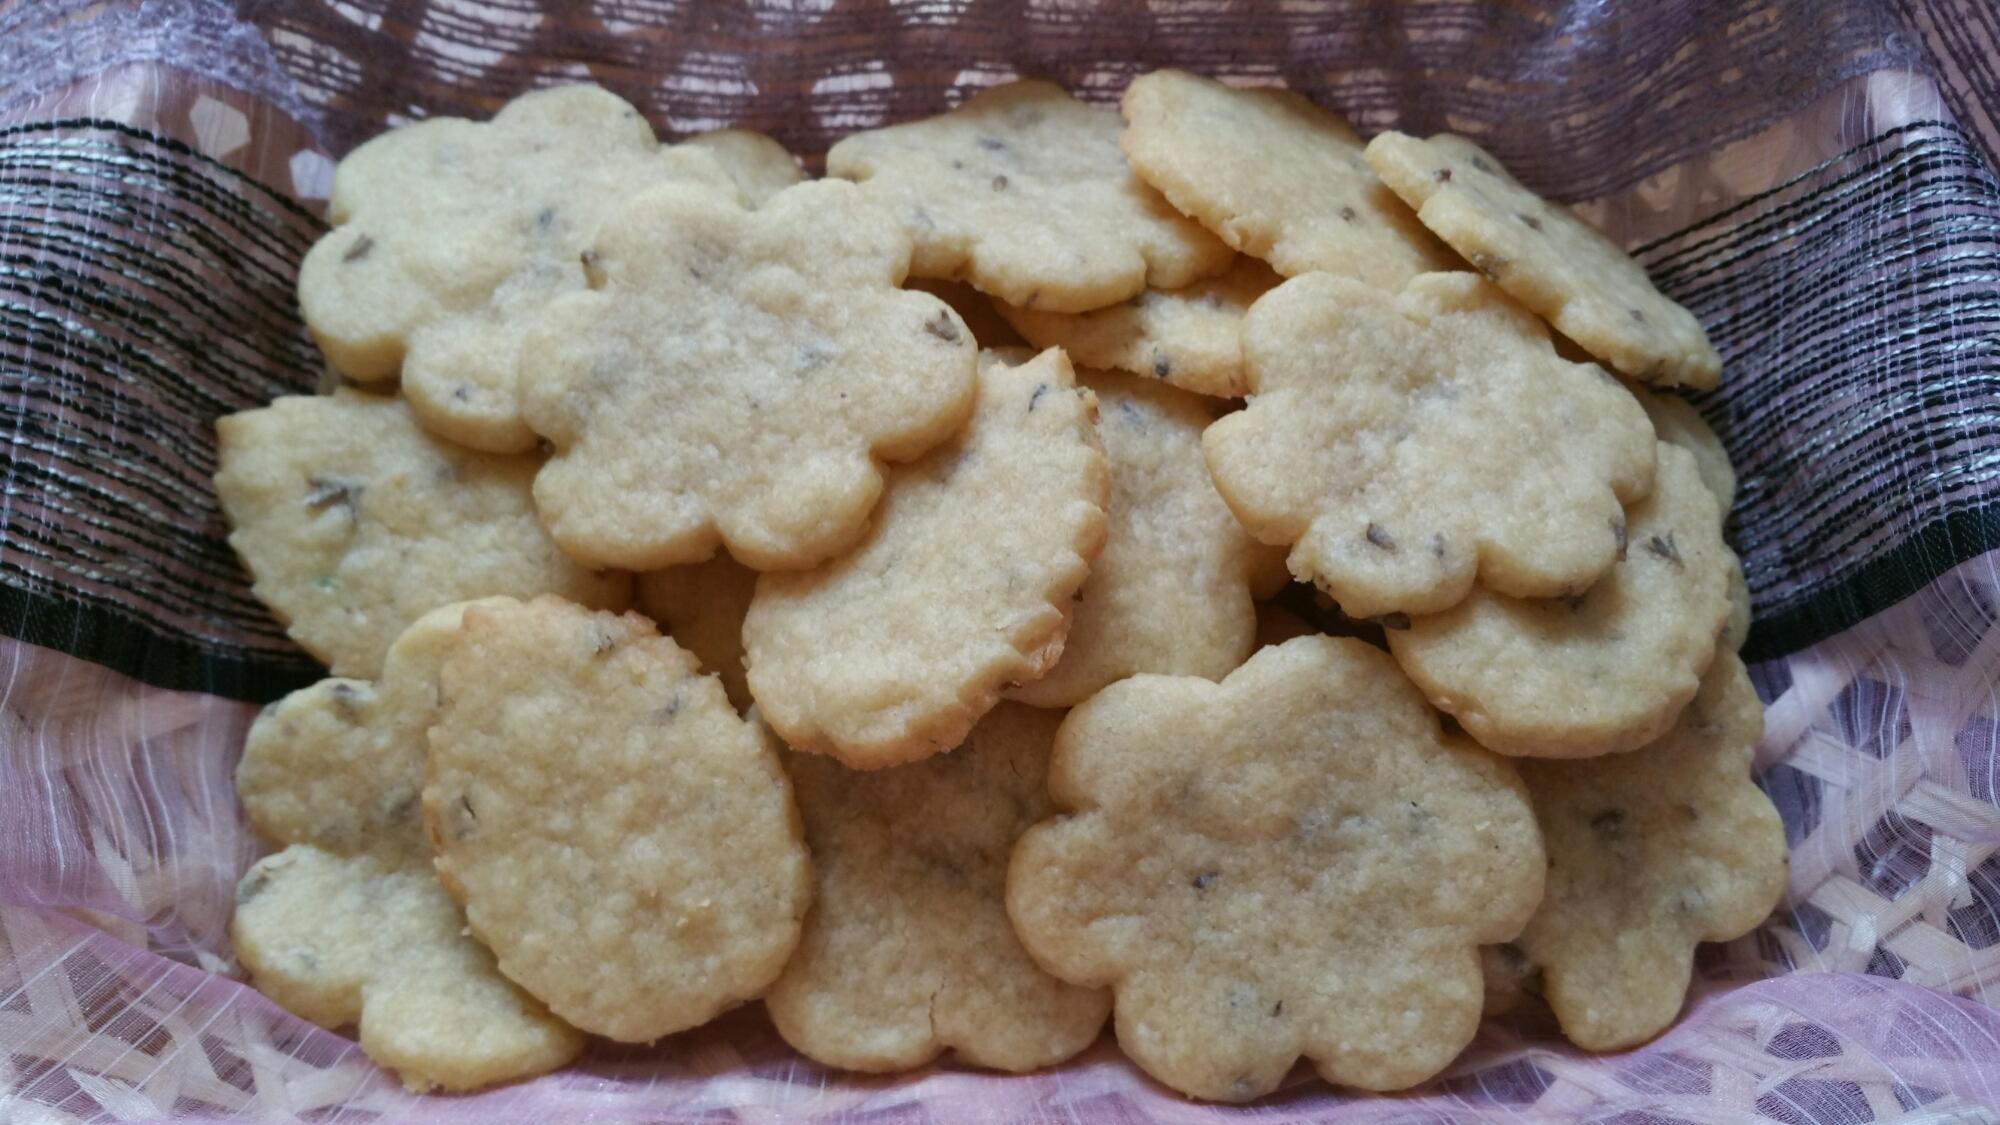 Lavender sugar cookies | Natascha's Palace